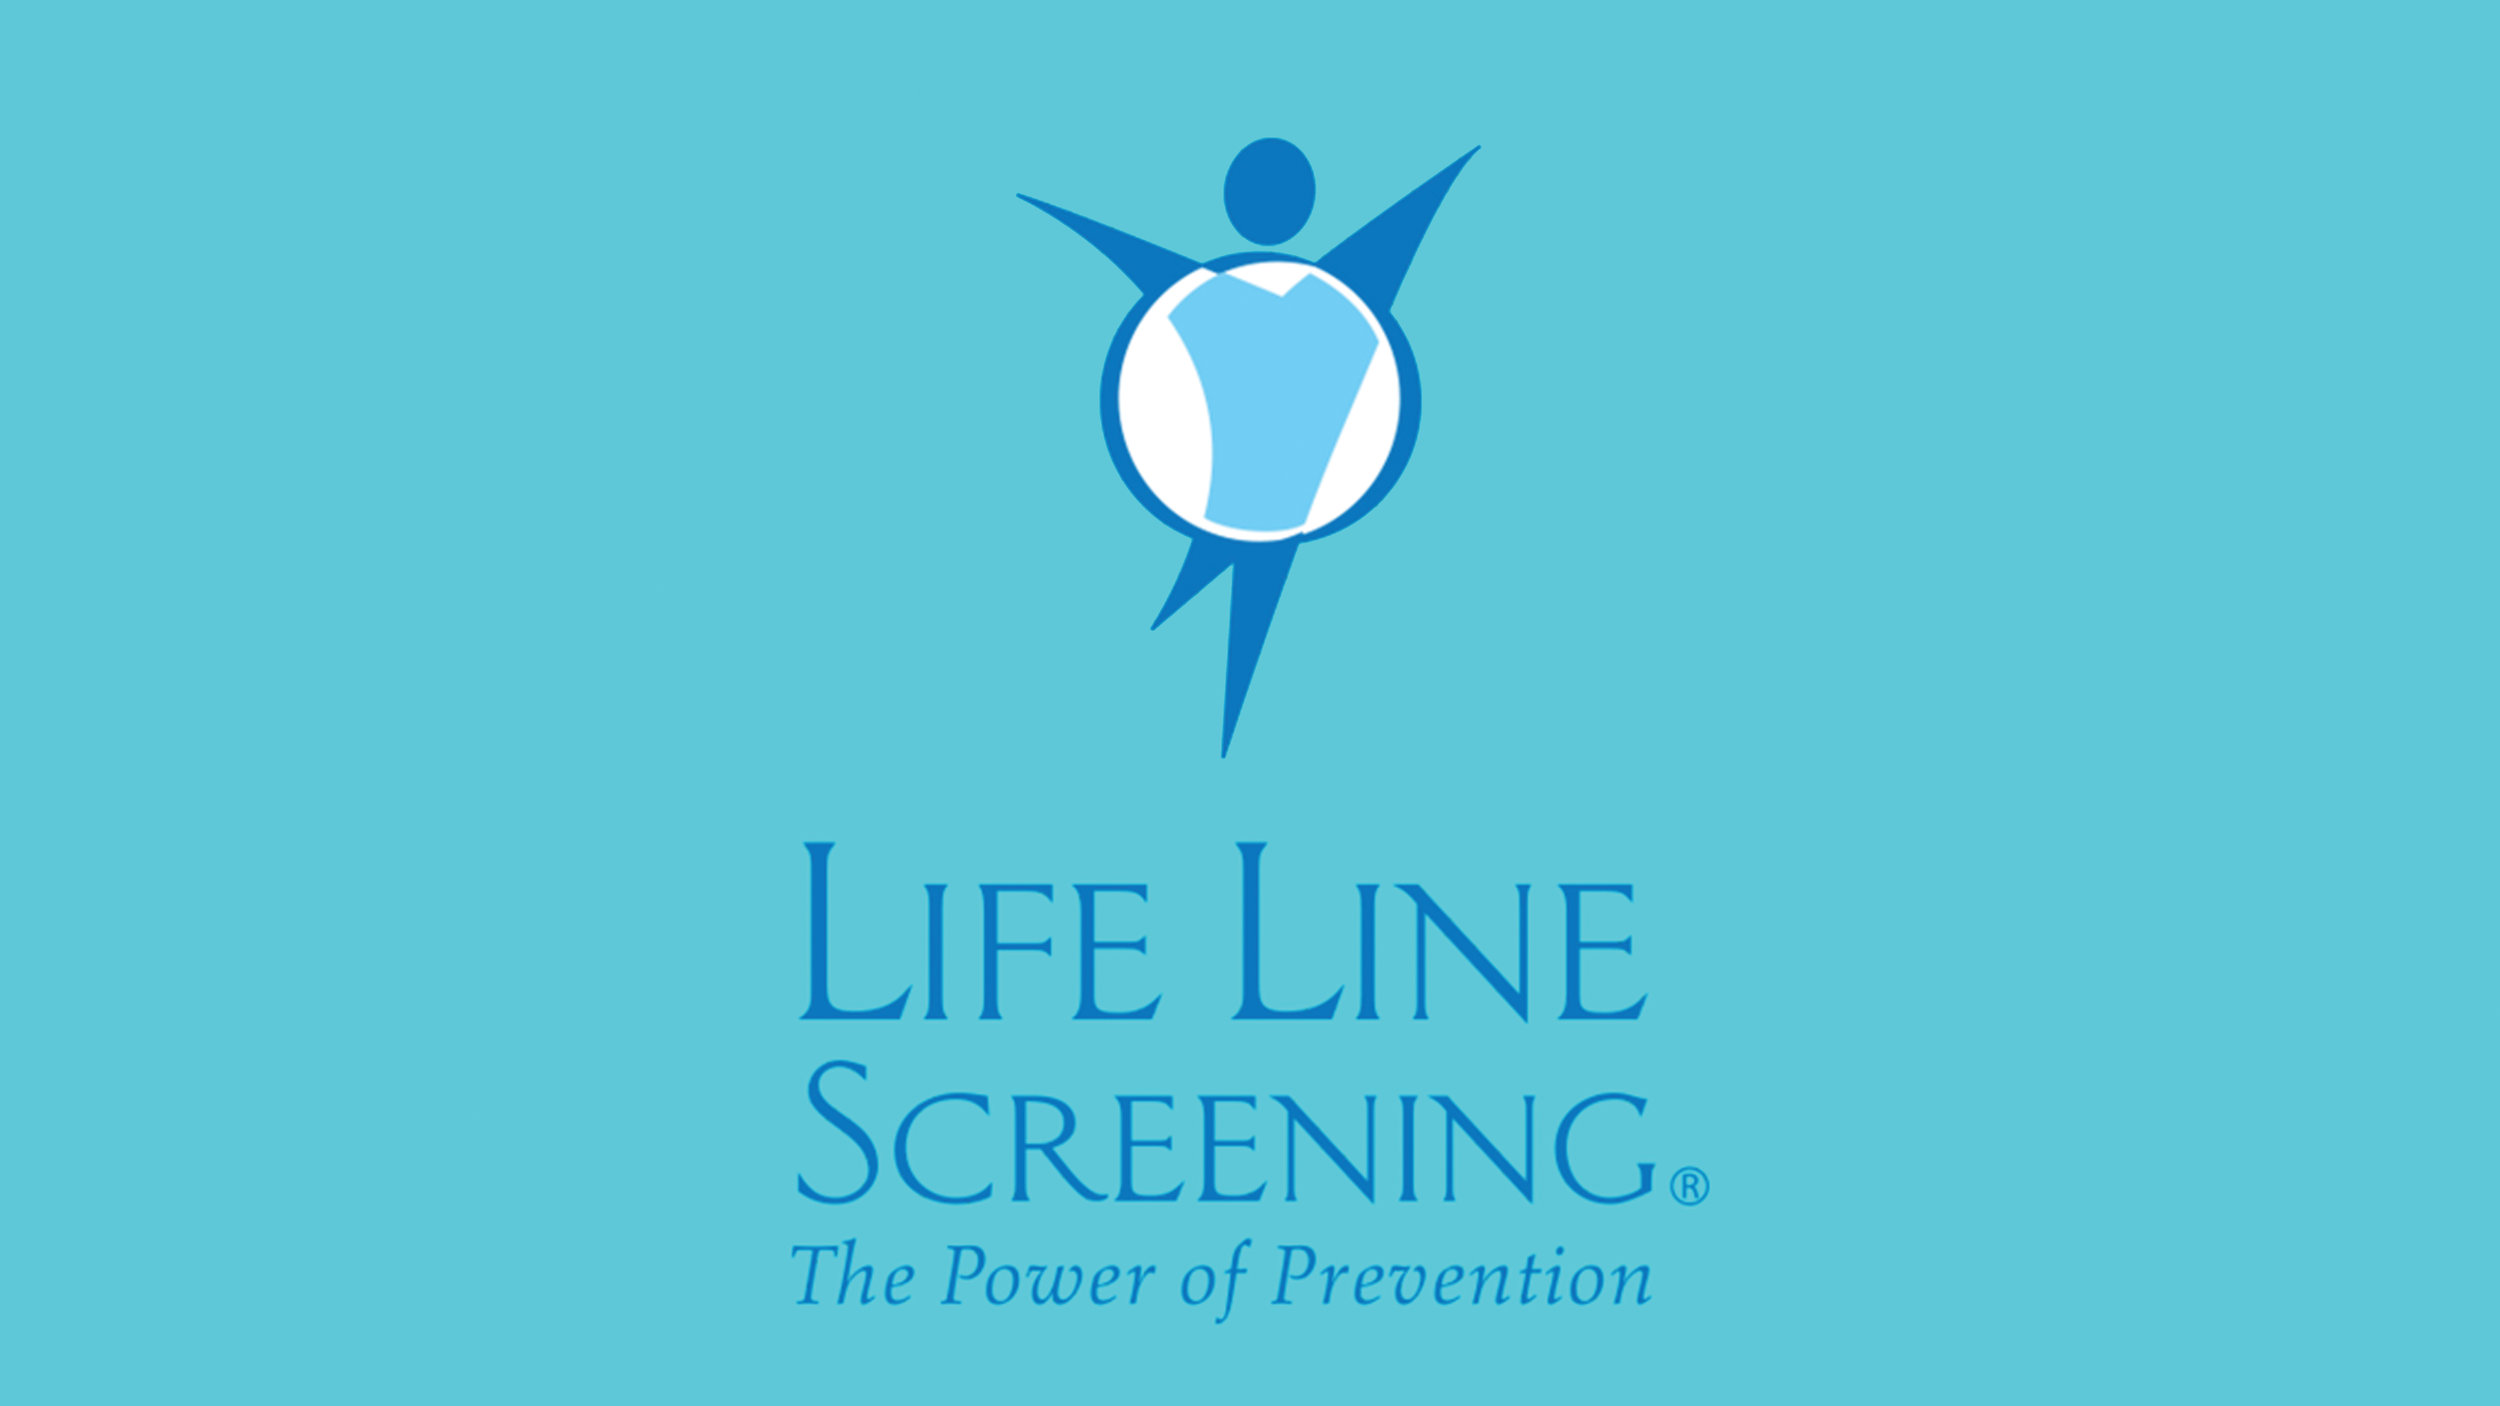 screen_lifeline_screening.jpg